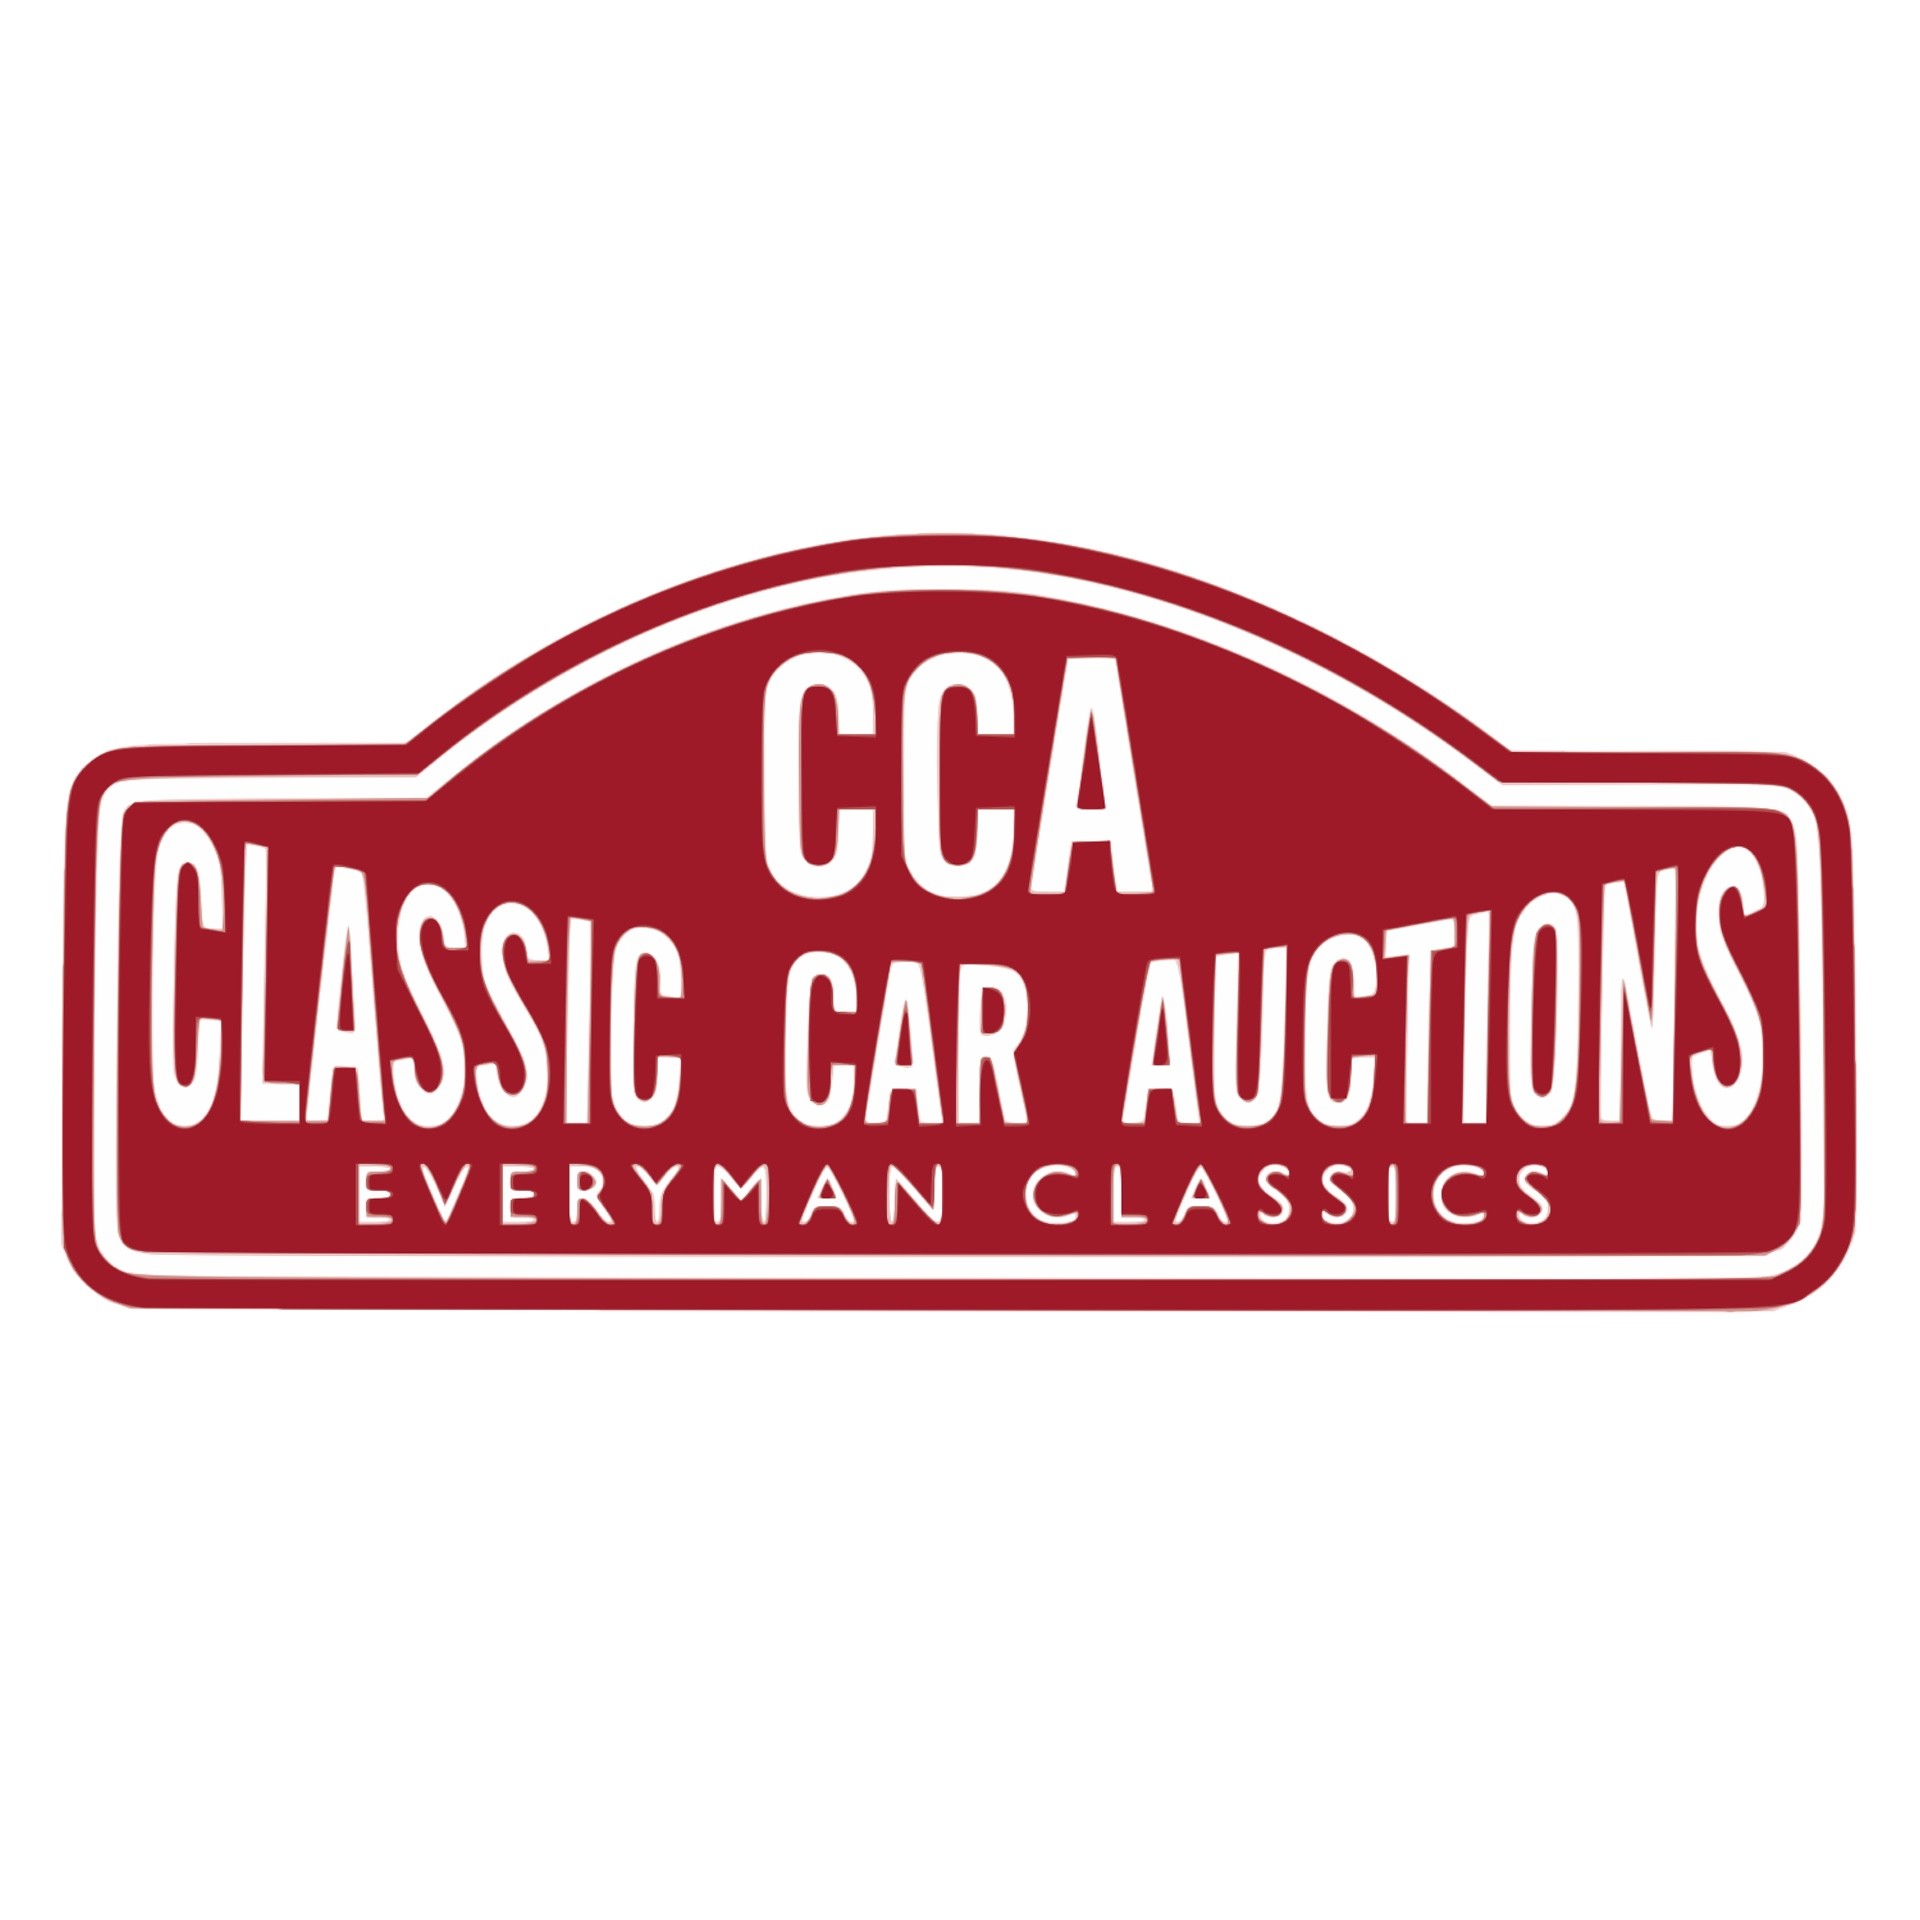 Classic Car Auctions Ltd.